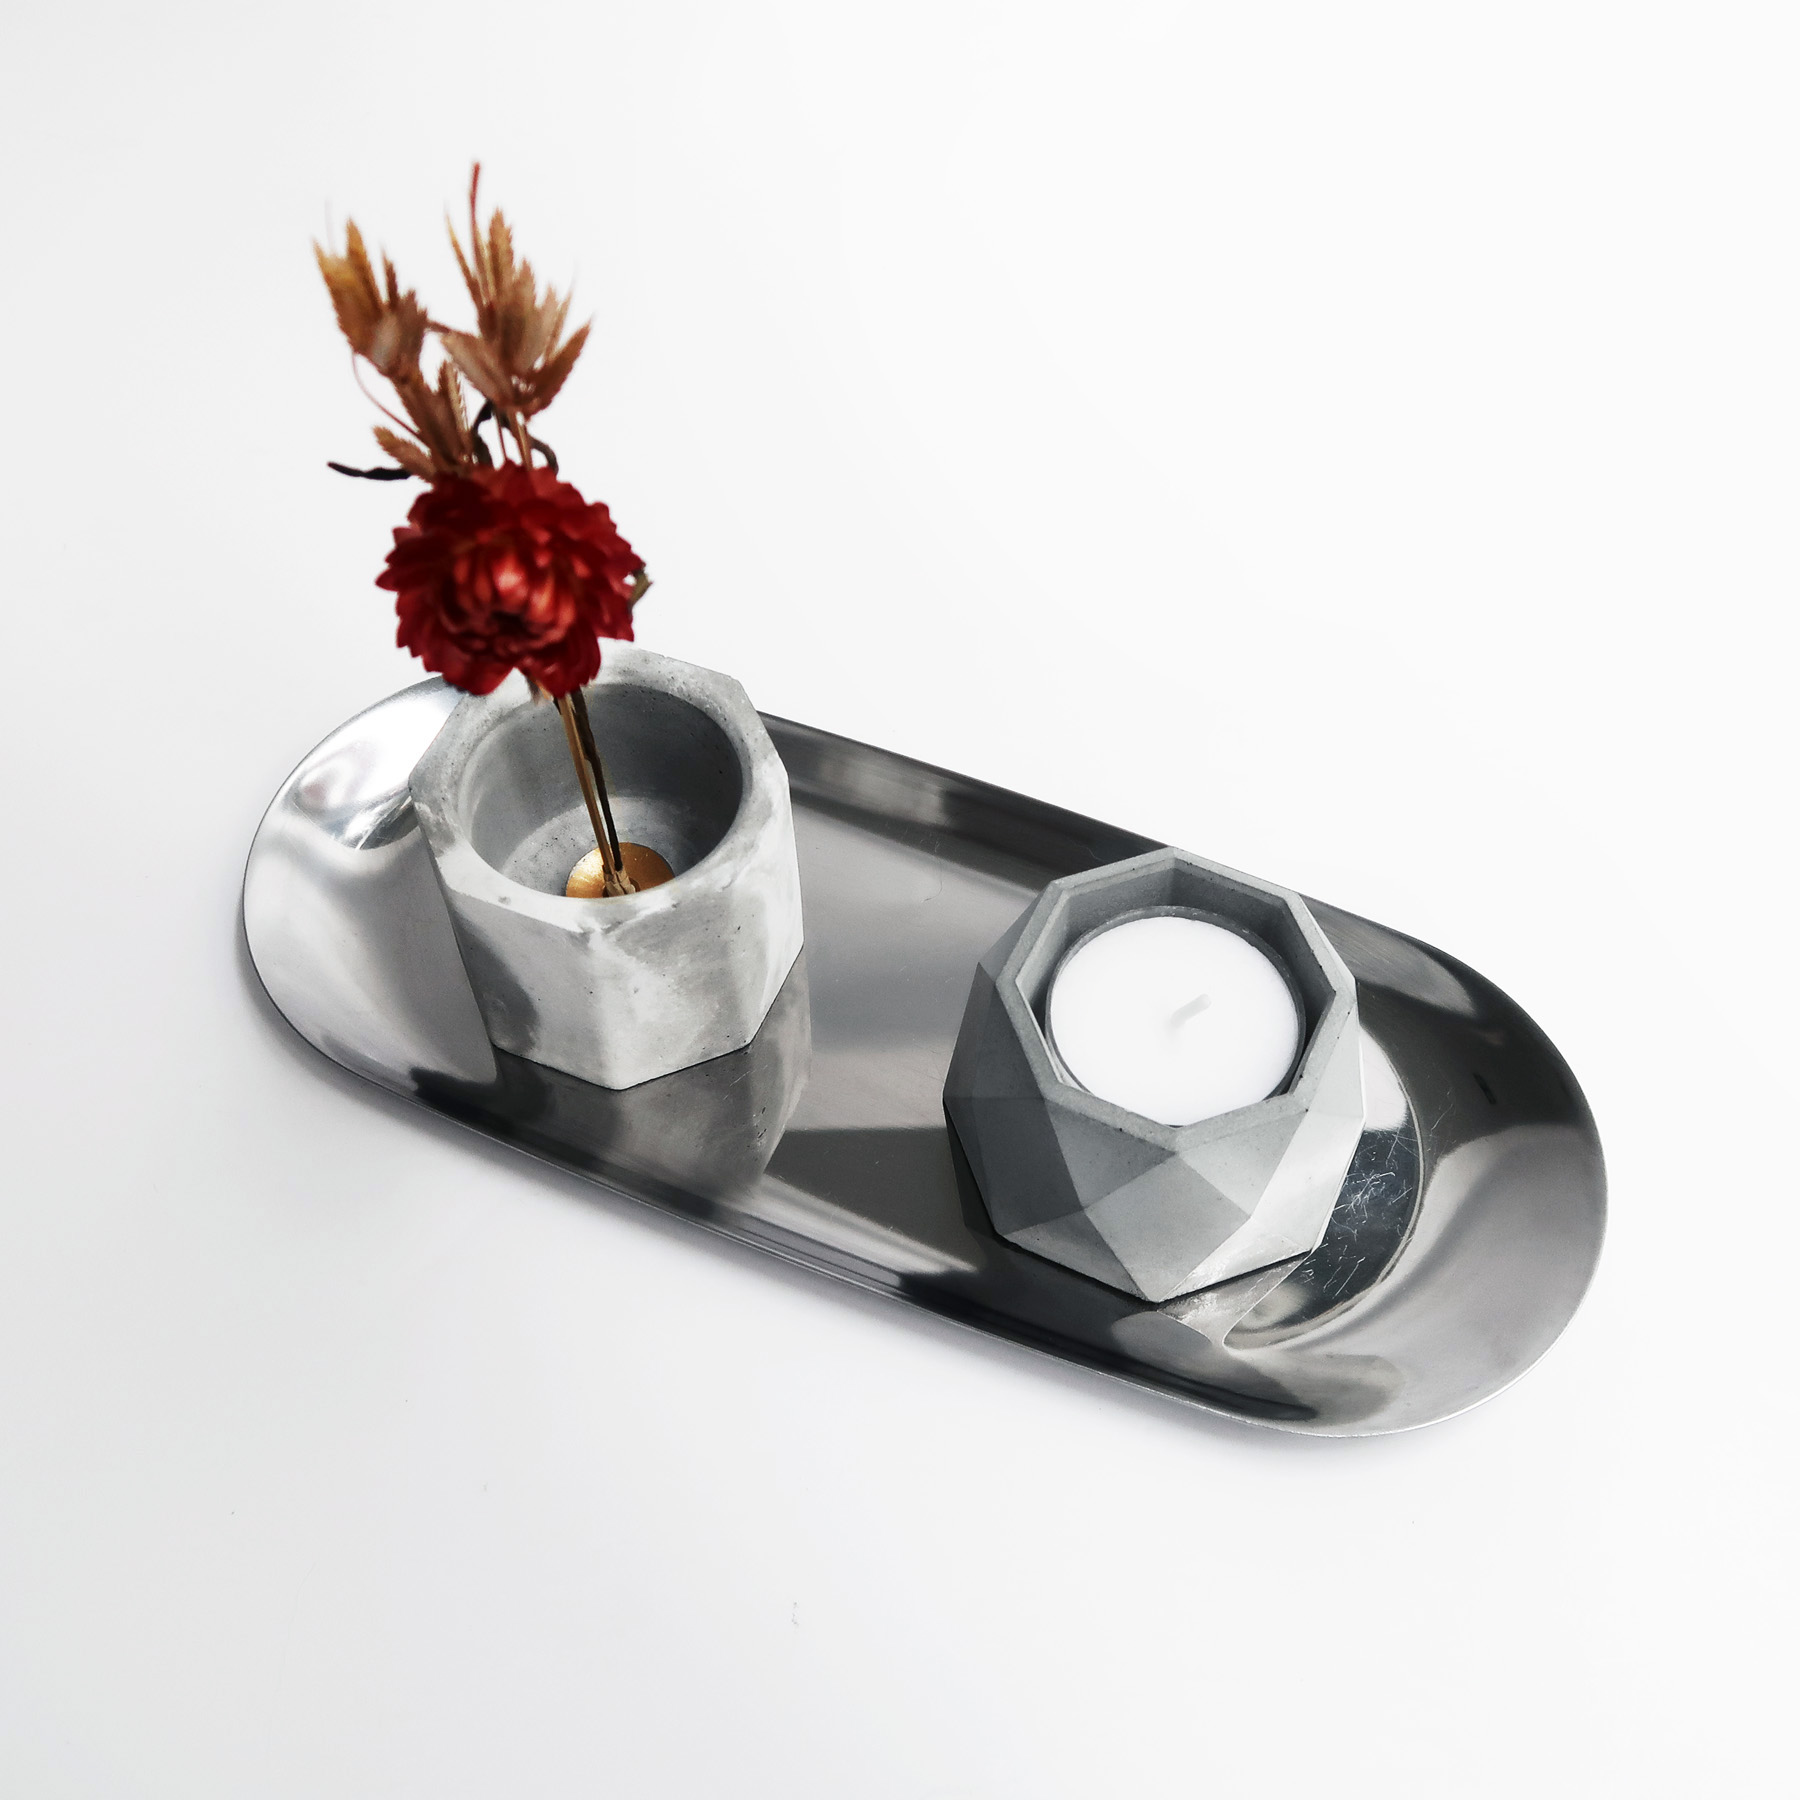 BLOOMING 綻放水泥黃銅花器・線香燭台・飾品盤禮盒組